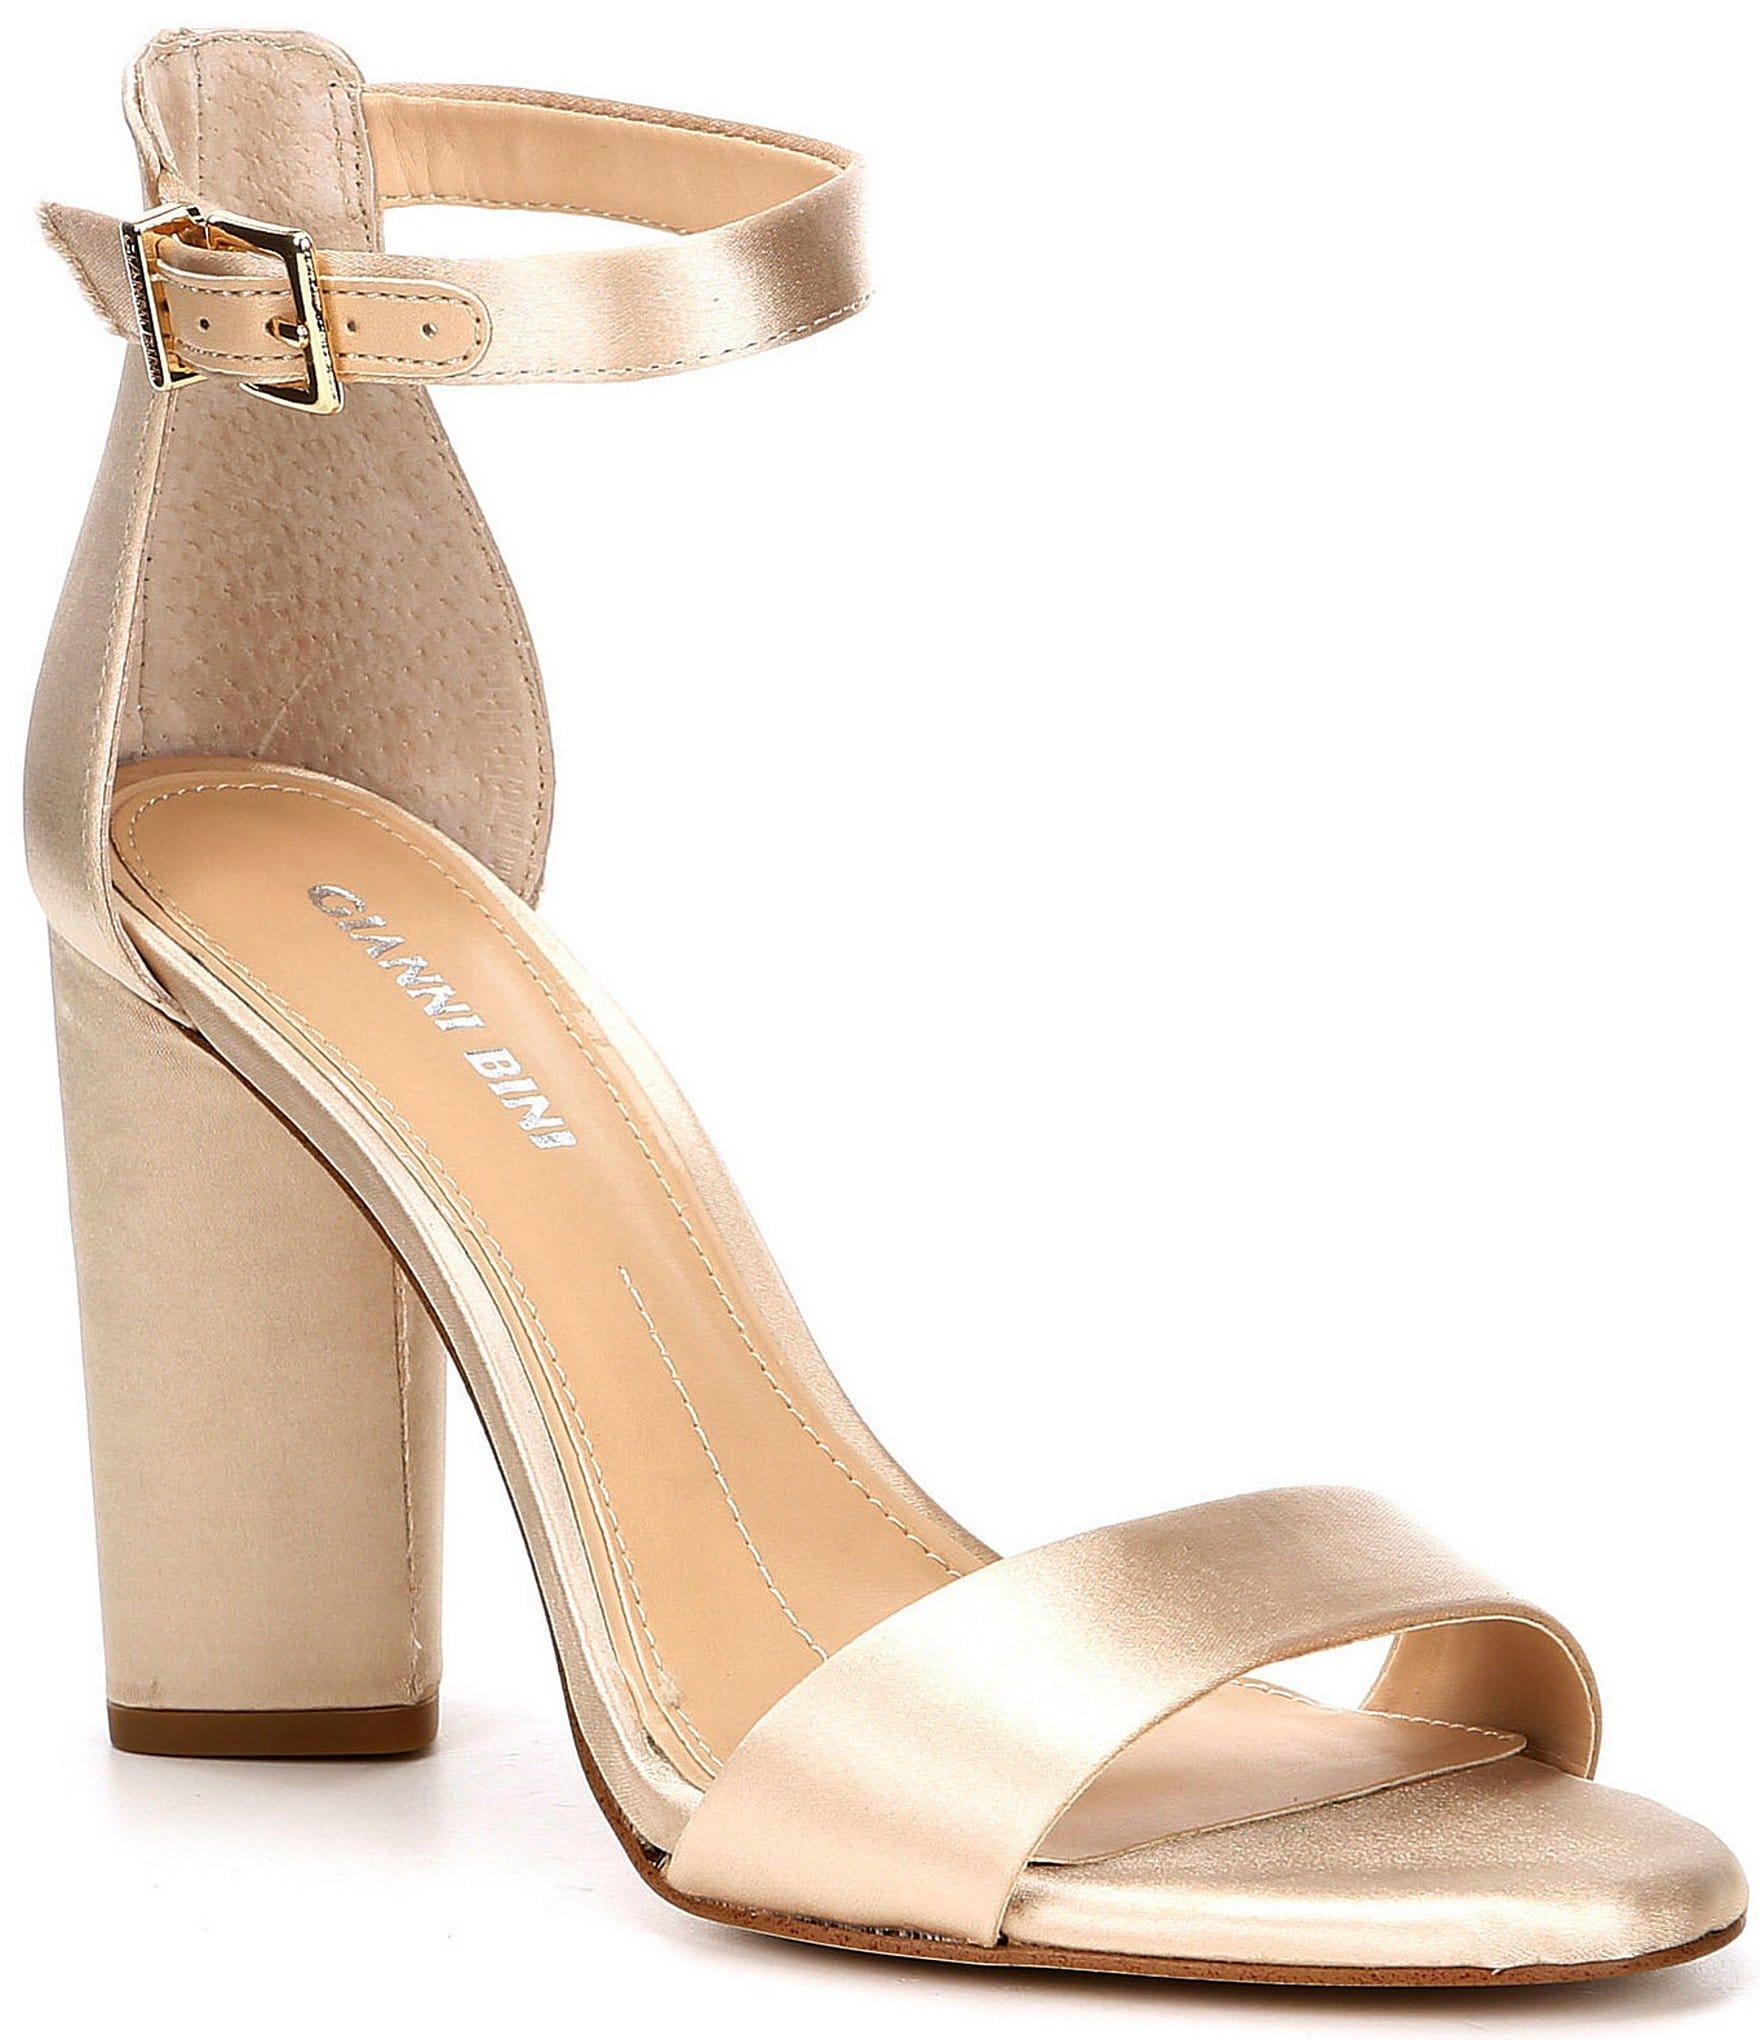 0df4858c7c9e9 Gianni Bini Joenah Satin Ankle Strap Block Heel Dress Sandals ...